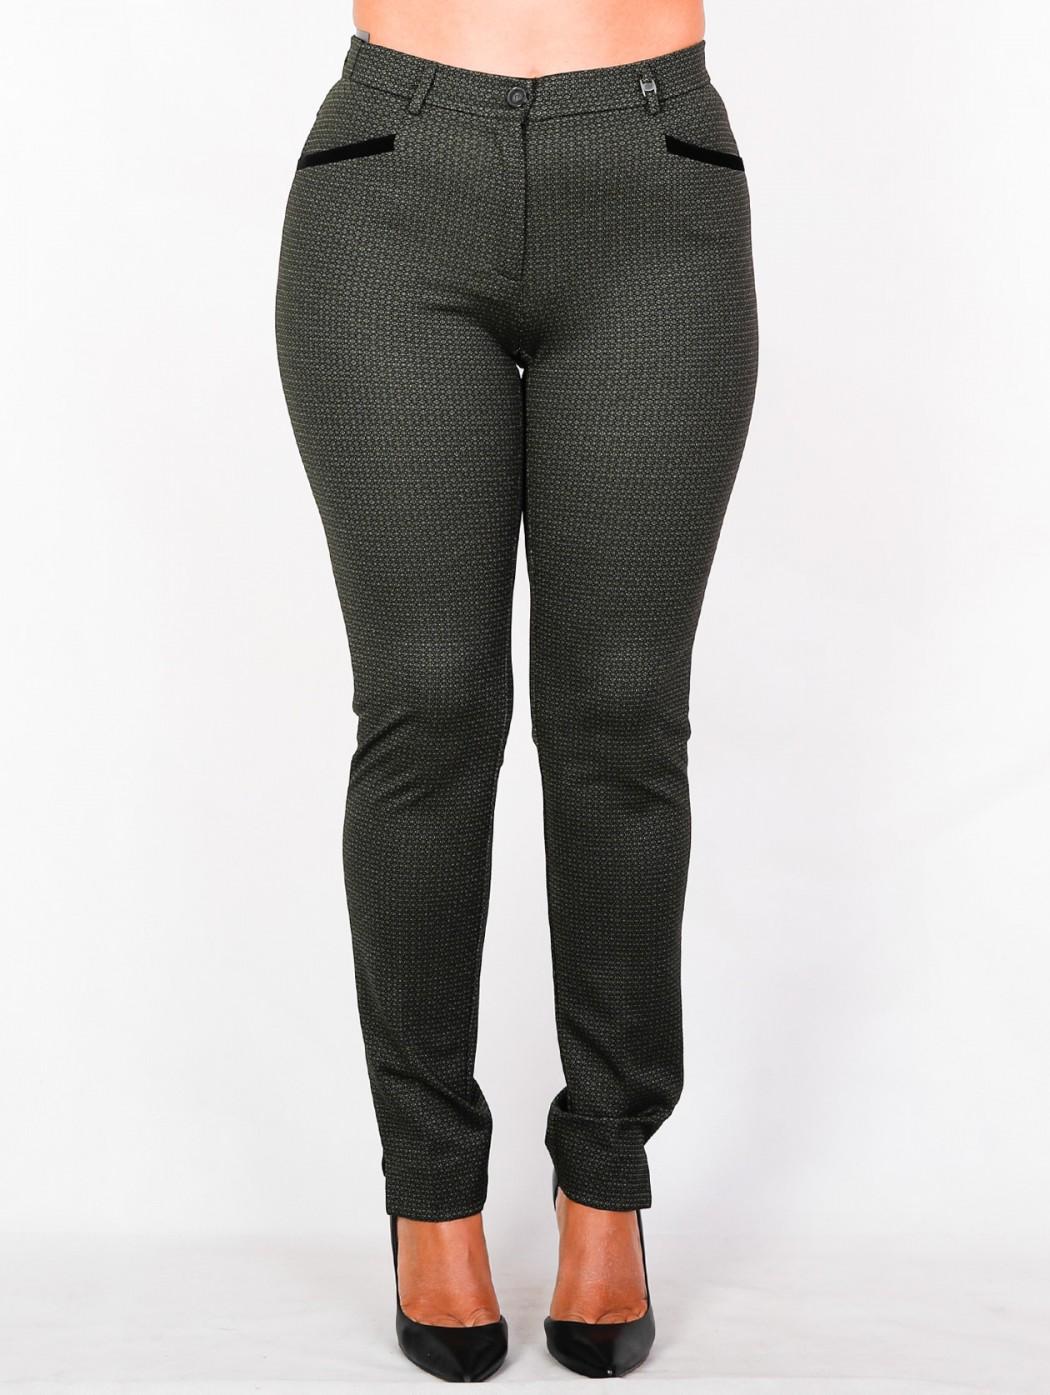 Pantaloni bordeaux L. Pucci...